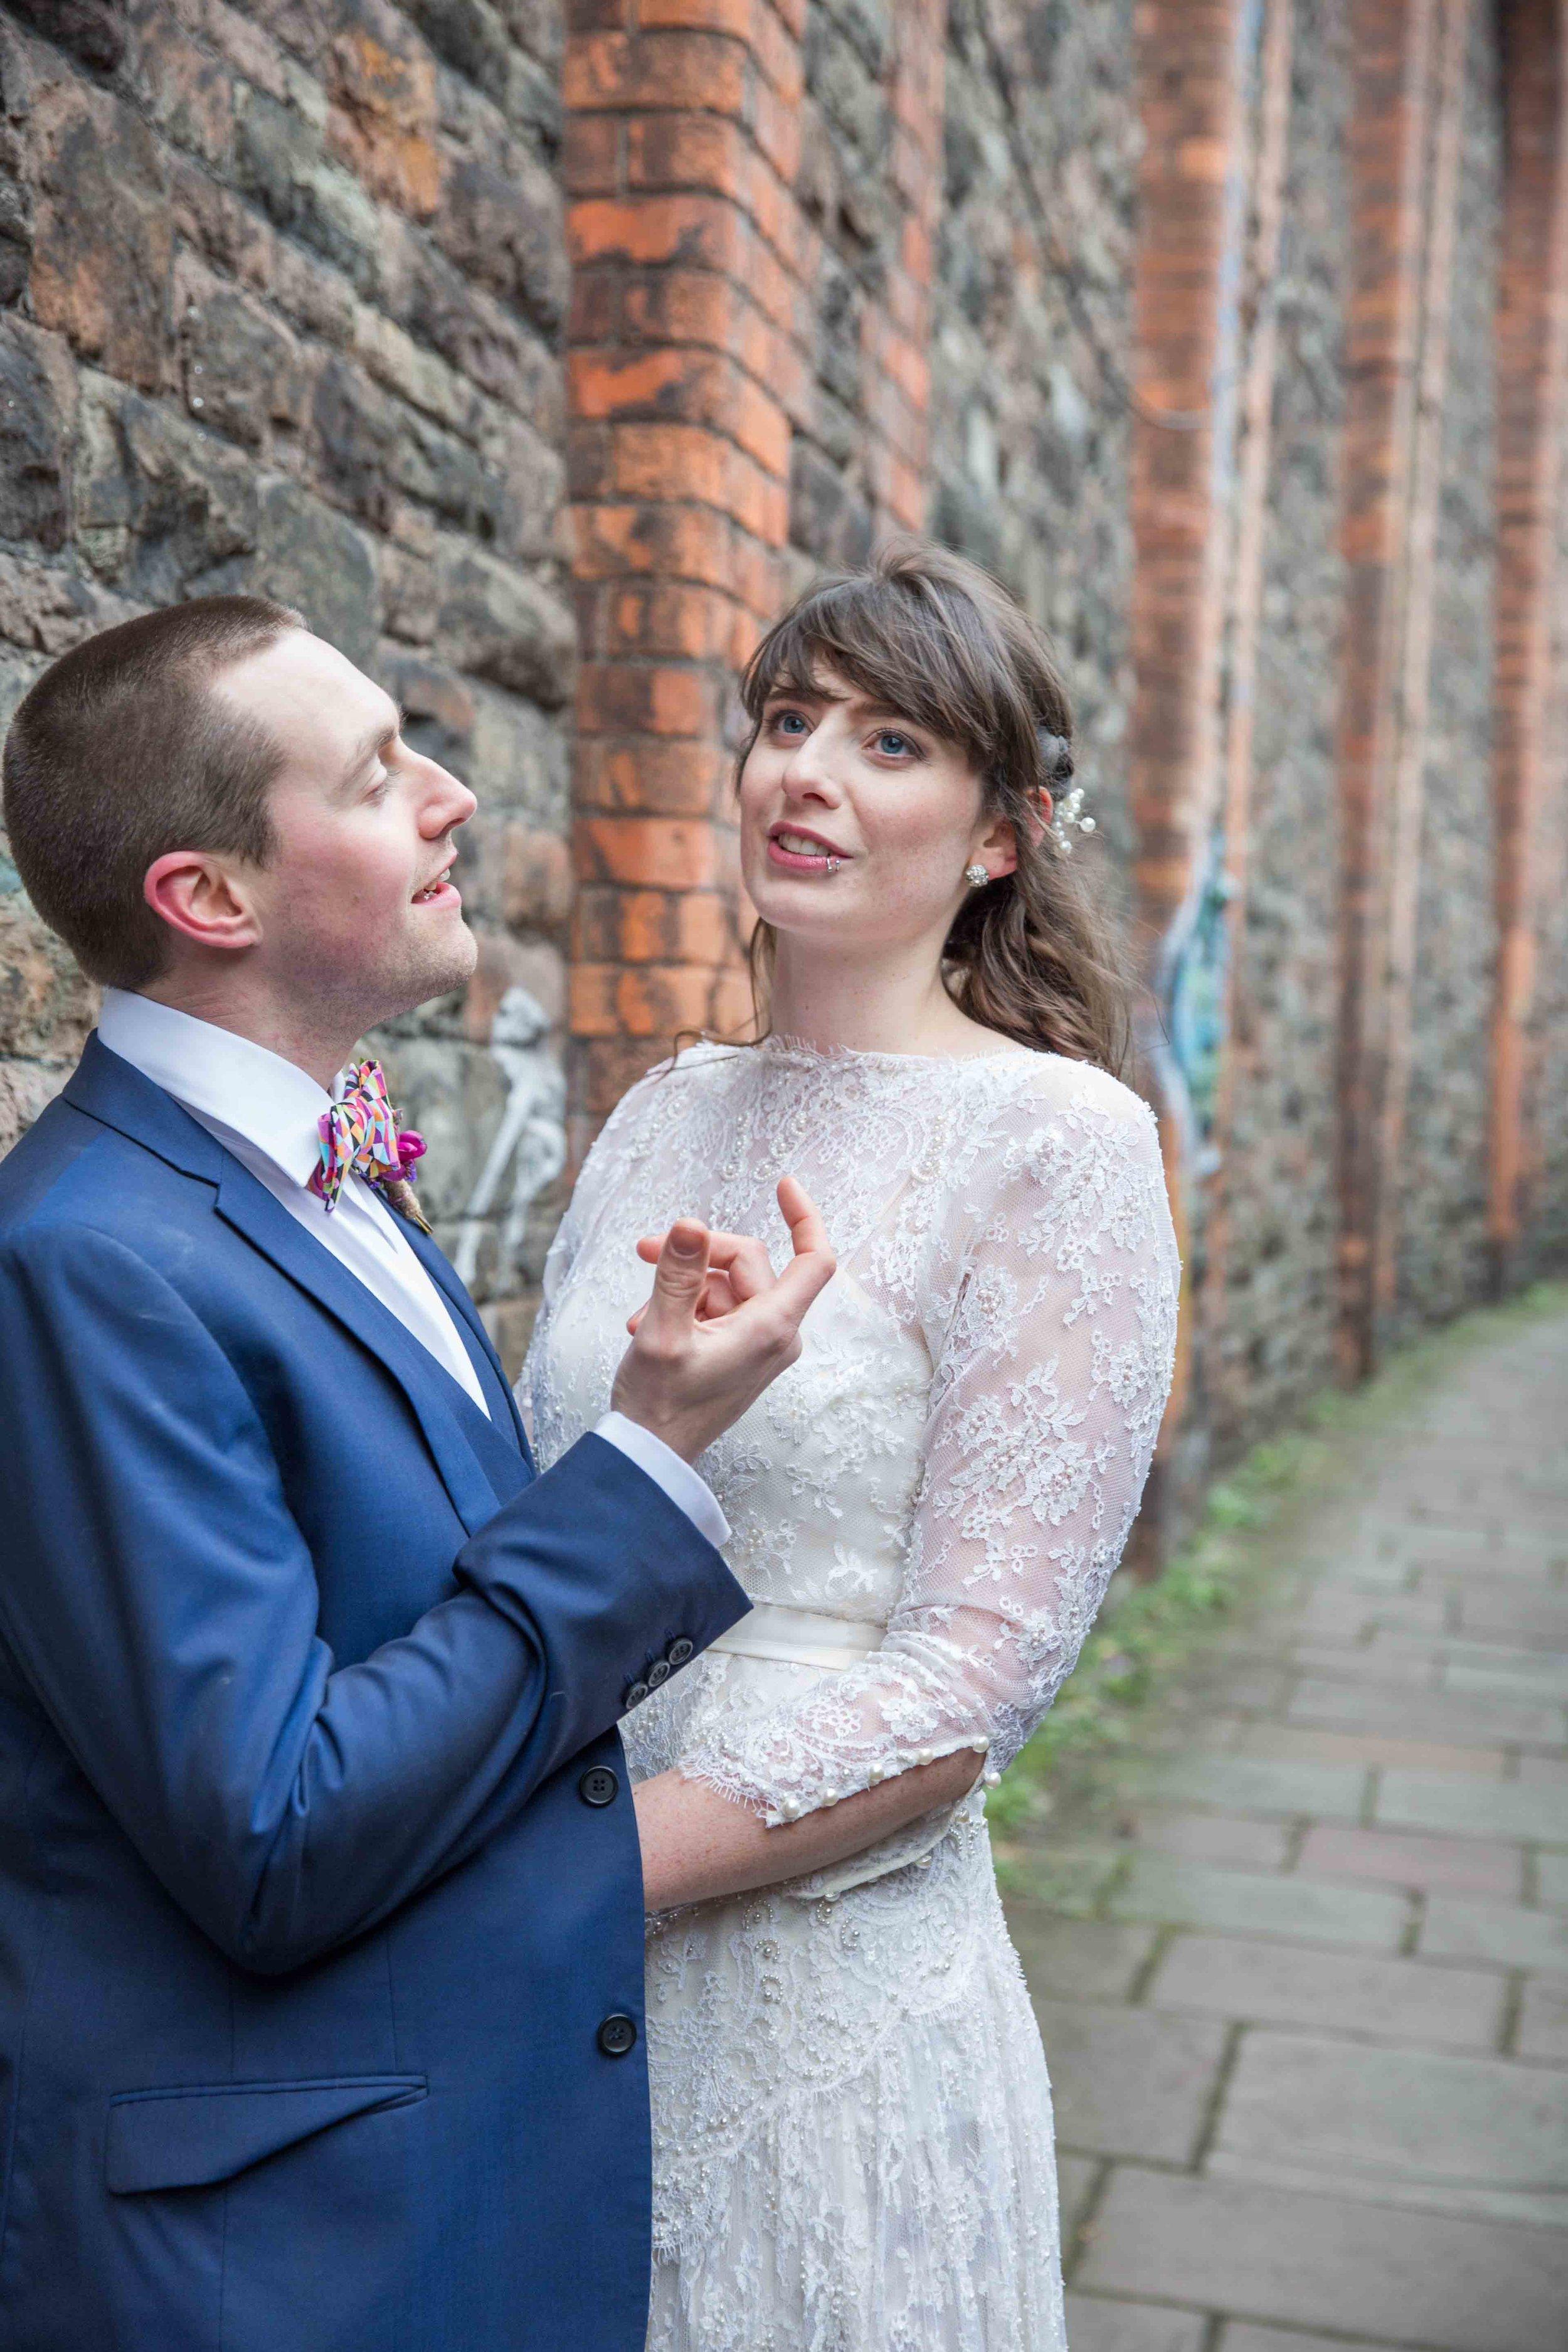 Adam & Faye - Wright Wedding Photography - Bristol Wedding Photographer -292.jpg